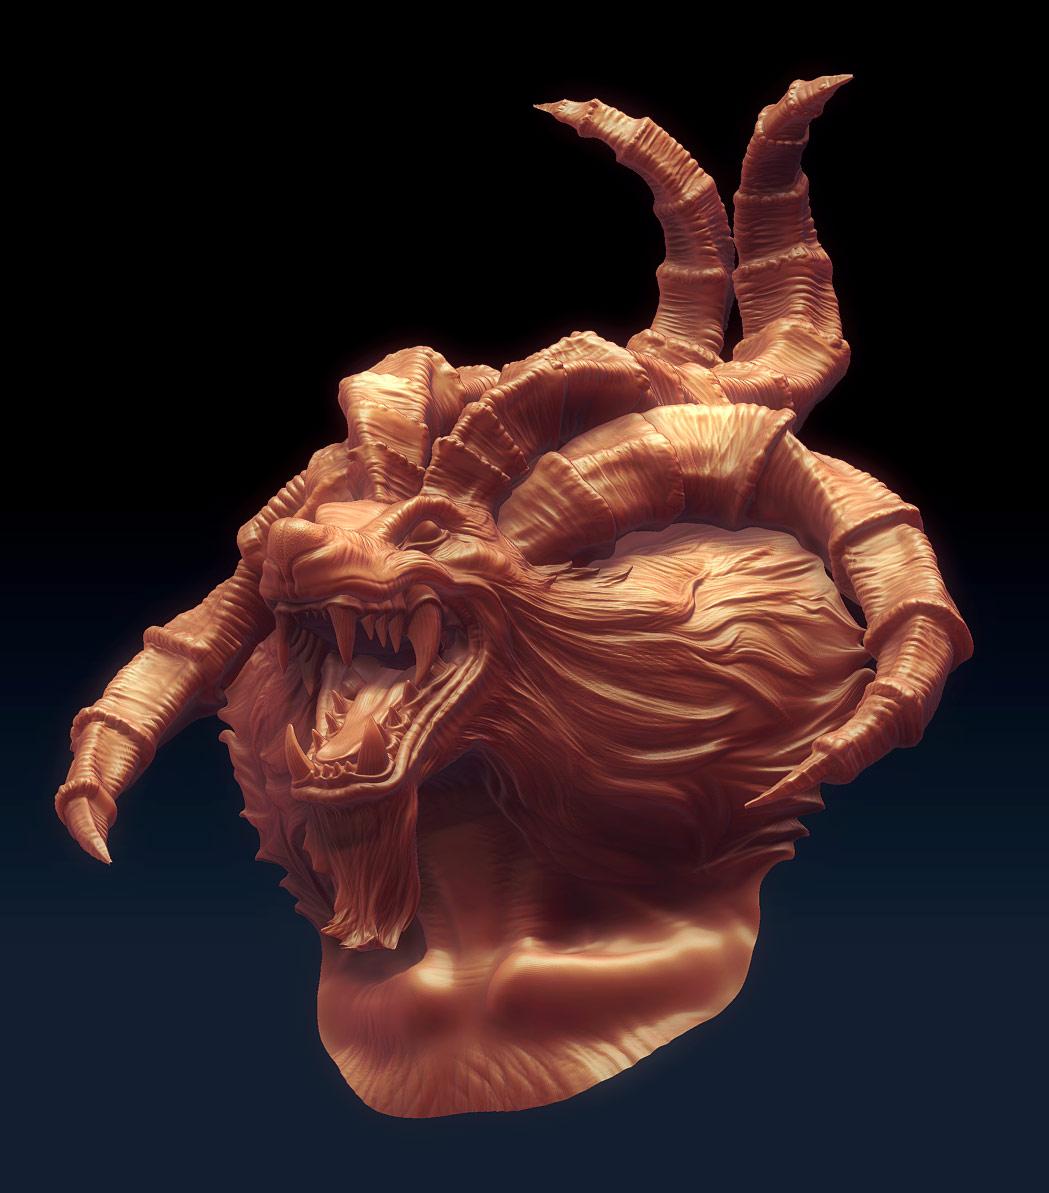 Impressive 3D Work